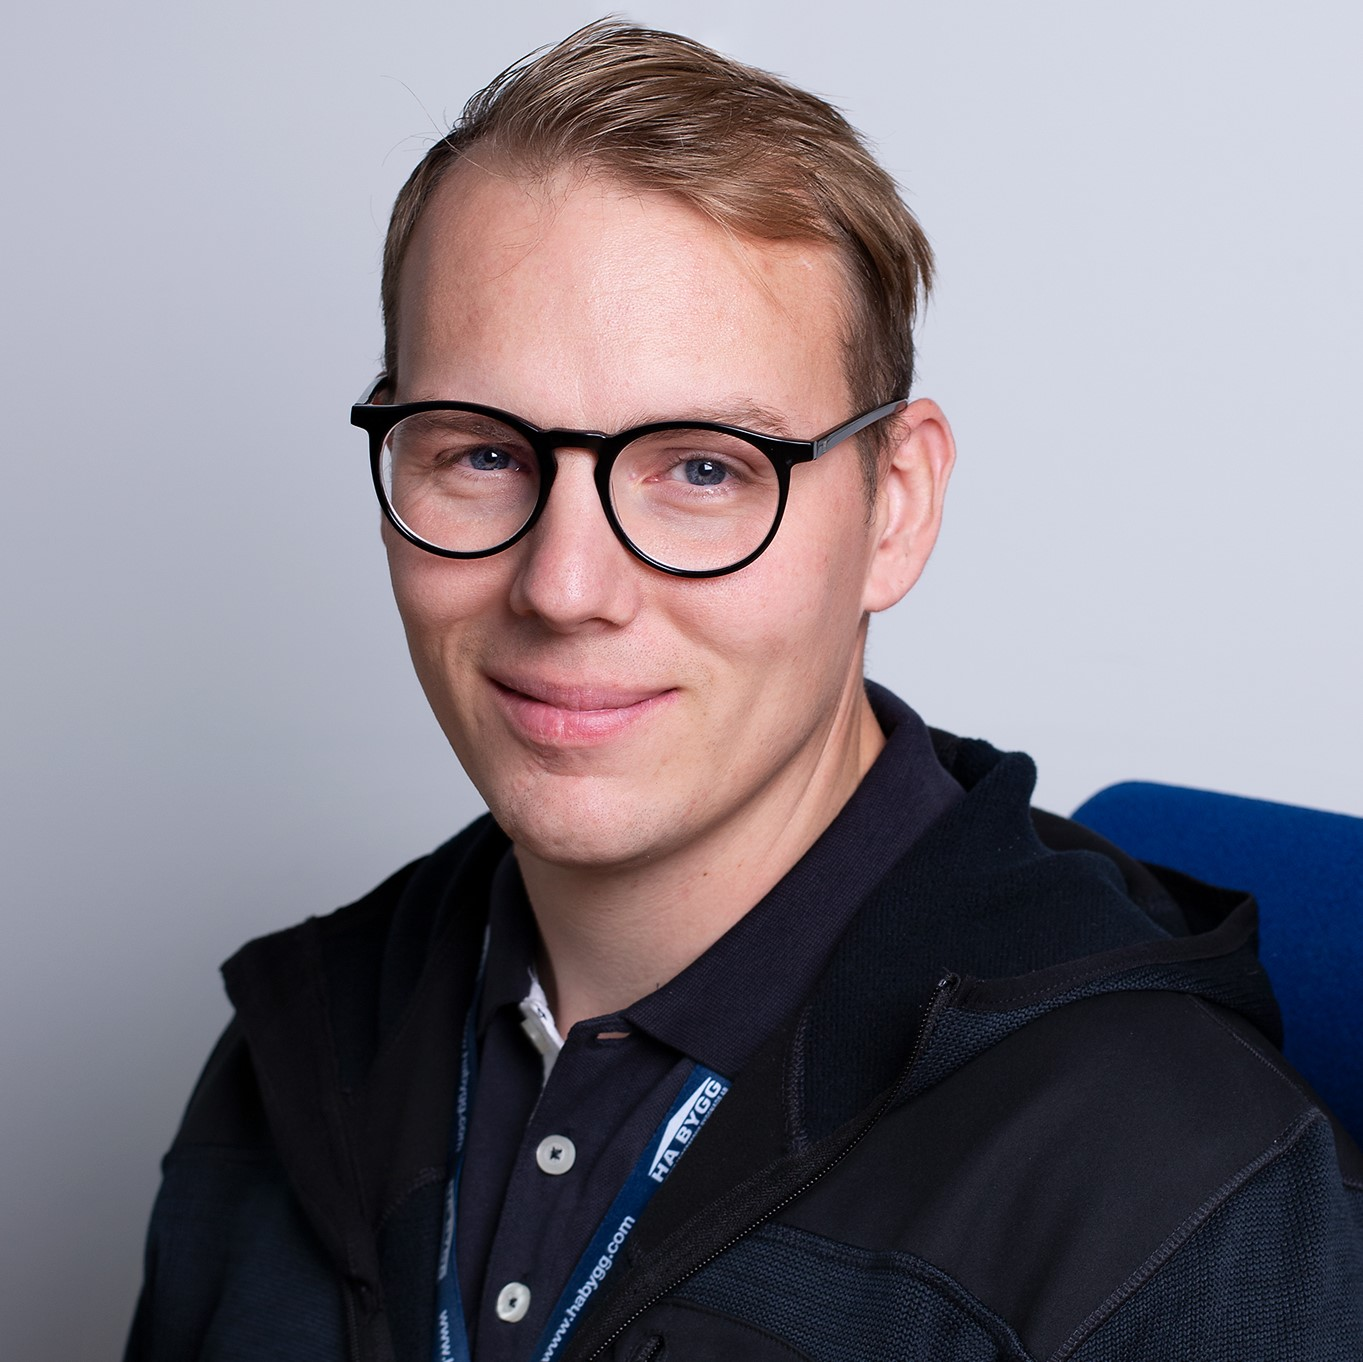 Daniel Hallström